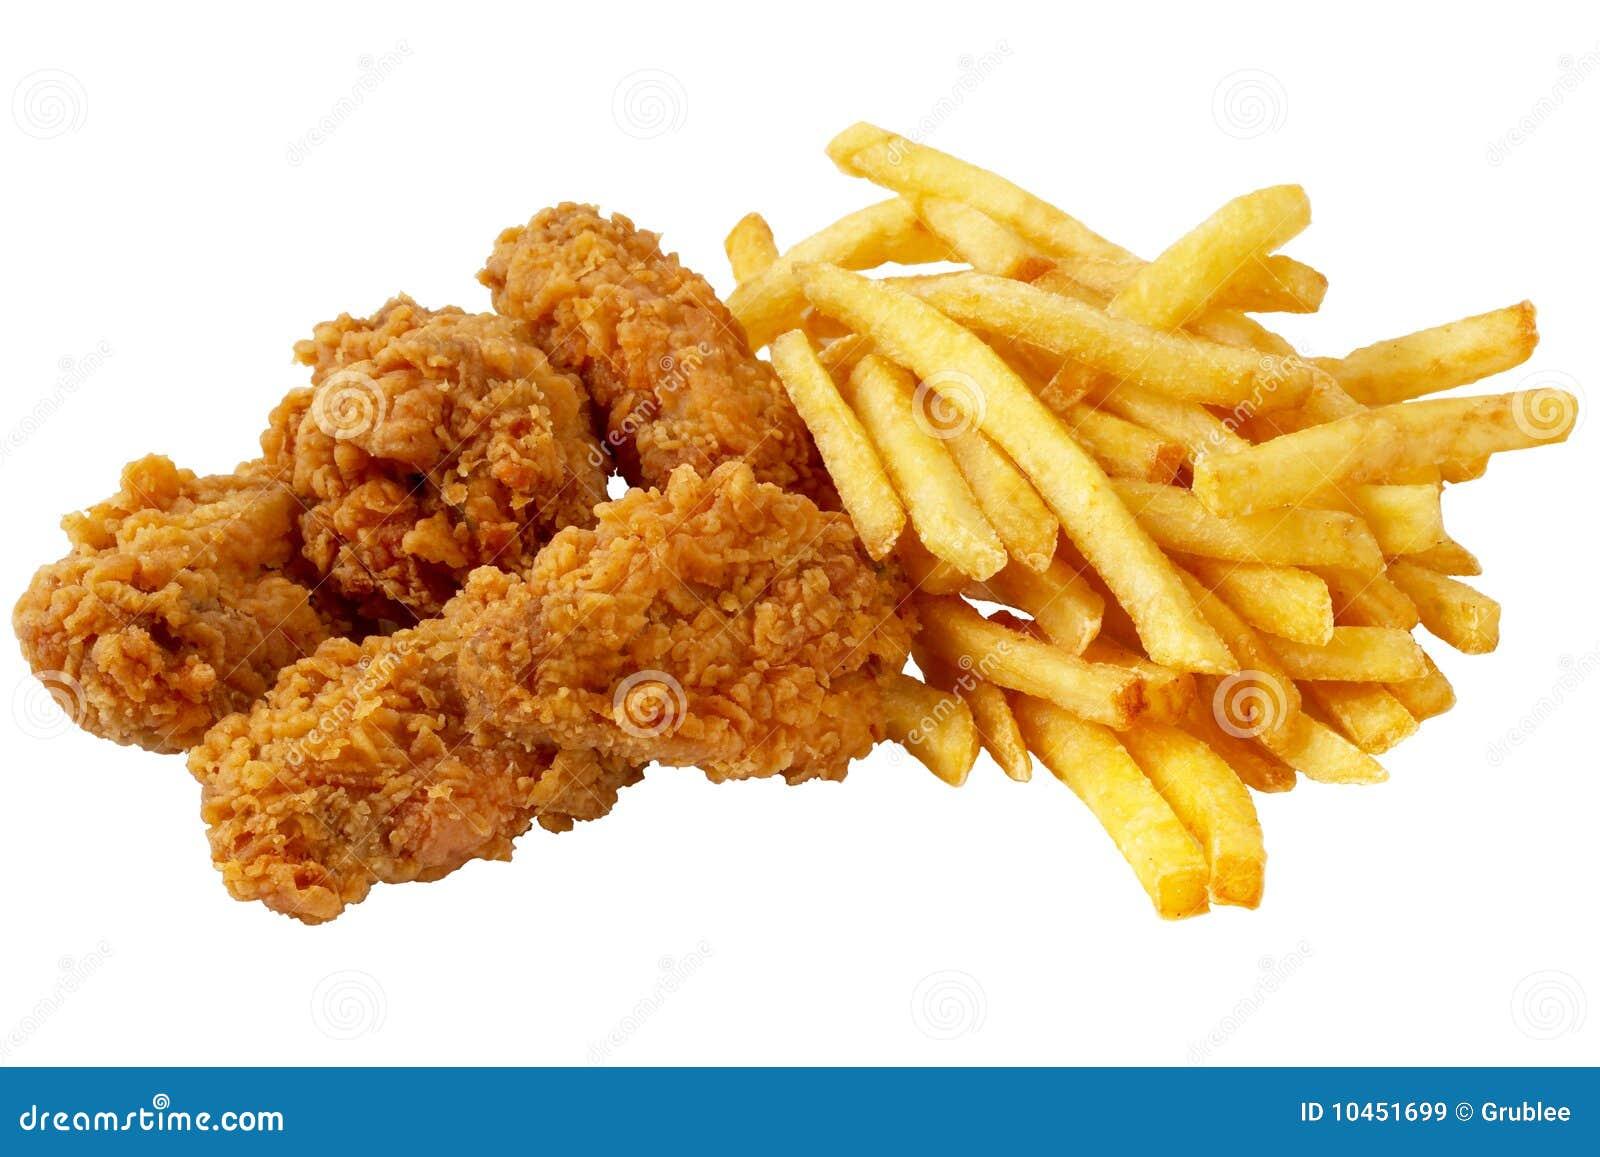 chicken nuggets max